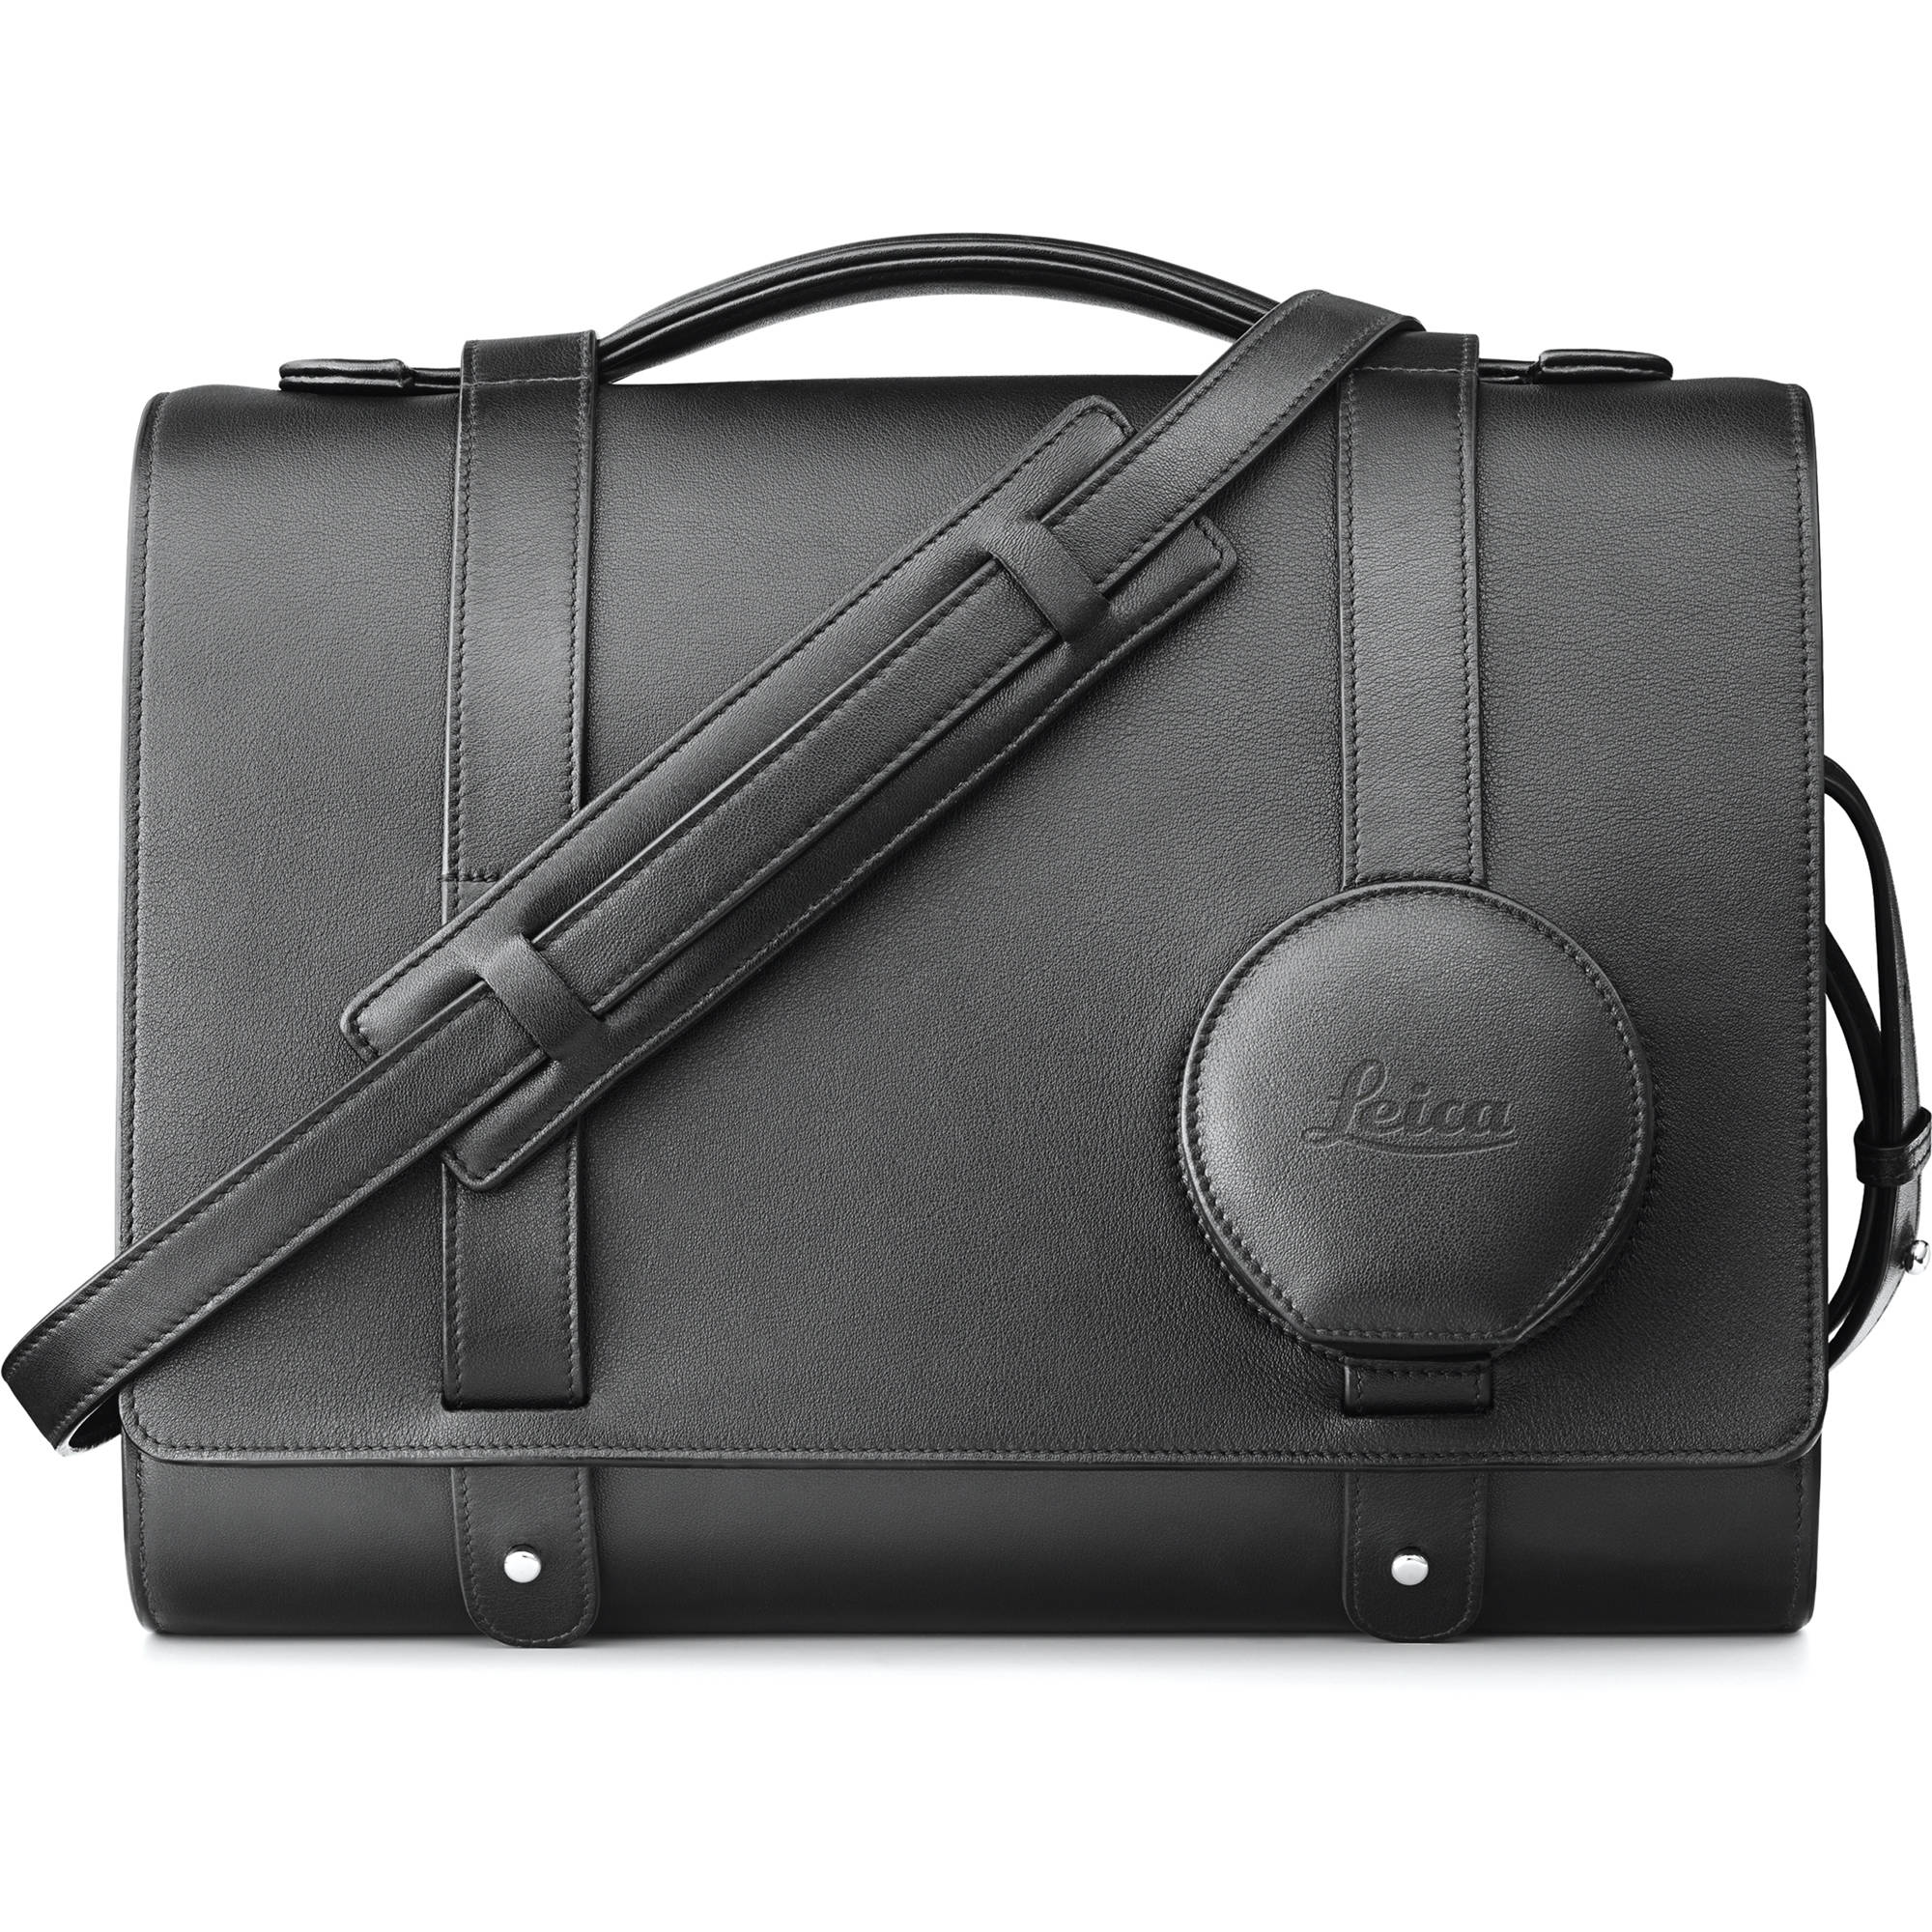 97eb392c5 Leica Day Bag for Leica Q Digital Camera (Black) 19504 B&H Photo